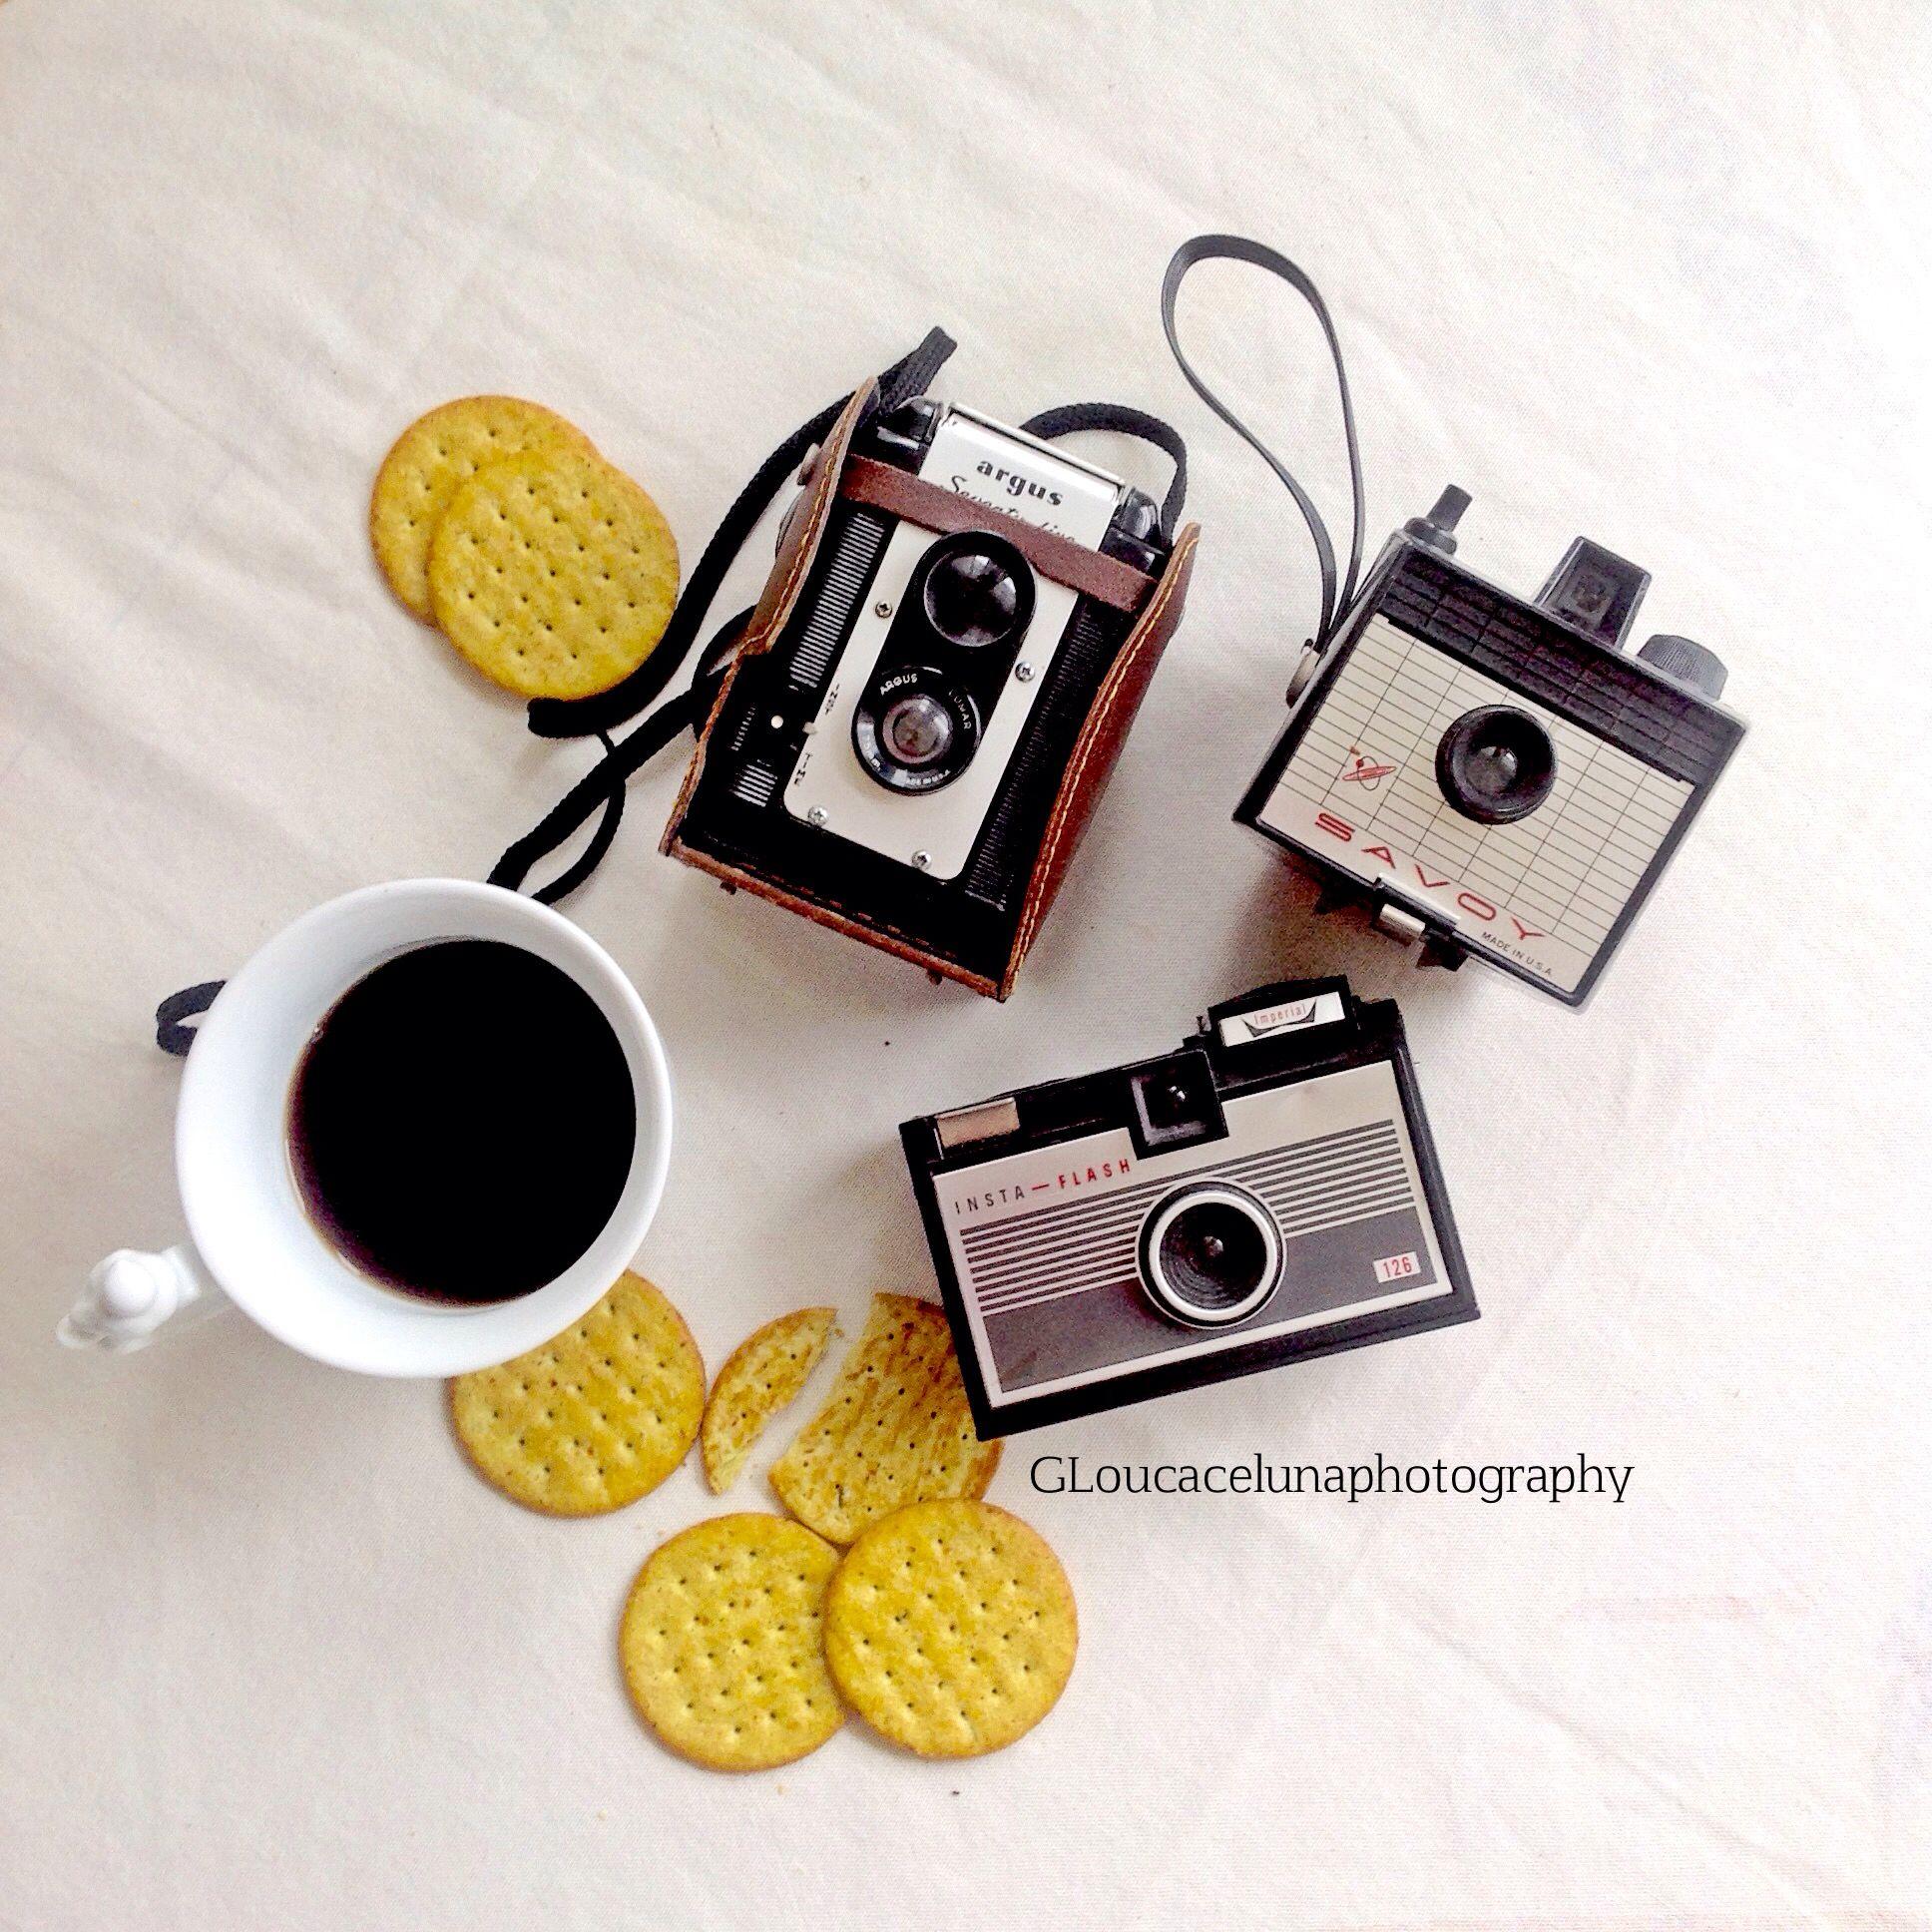 Vintage Cameras. GLoucacelunaphotography